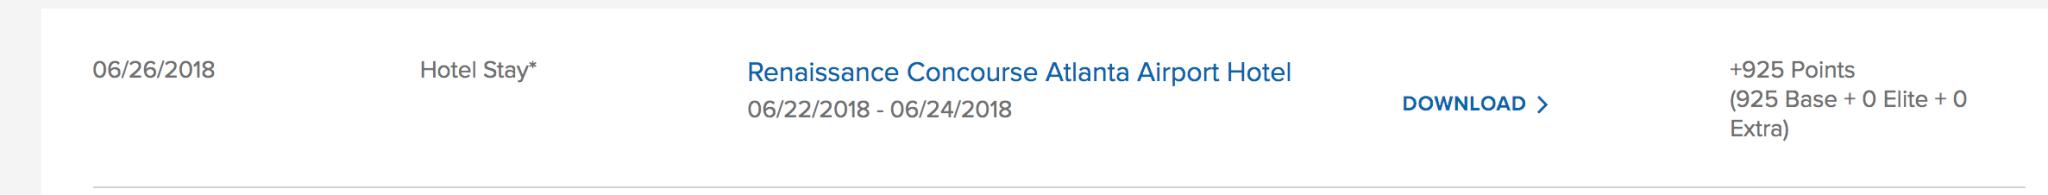 Review: The Atlanta Airport Renaissance Concourse Hotel